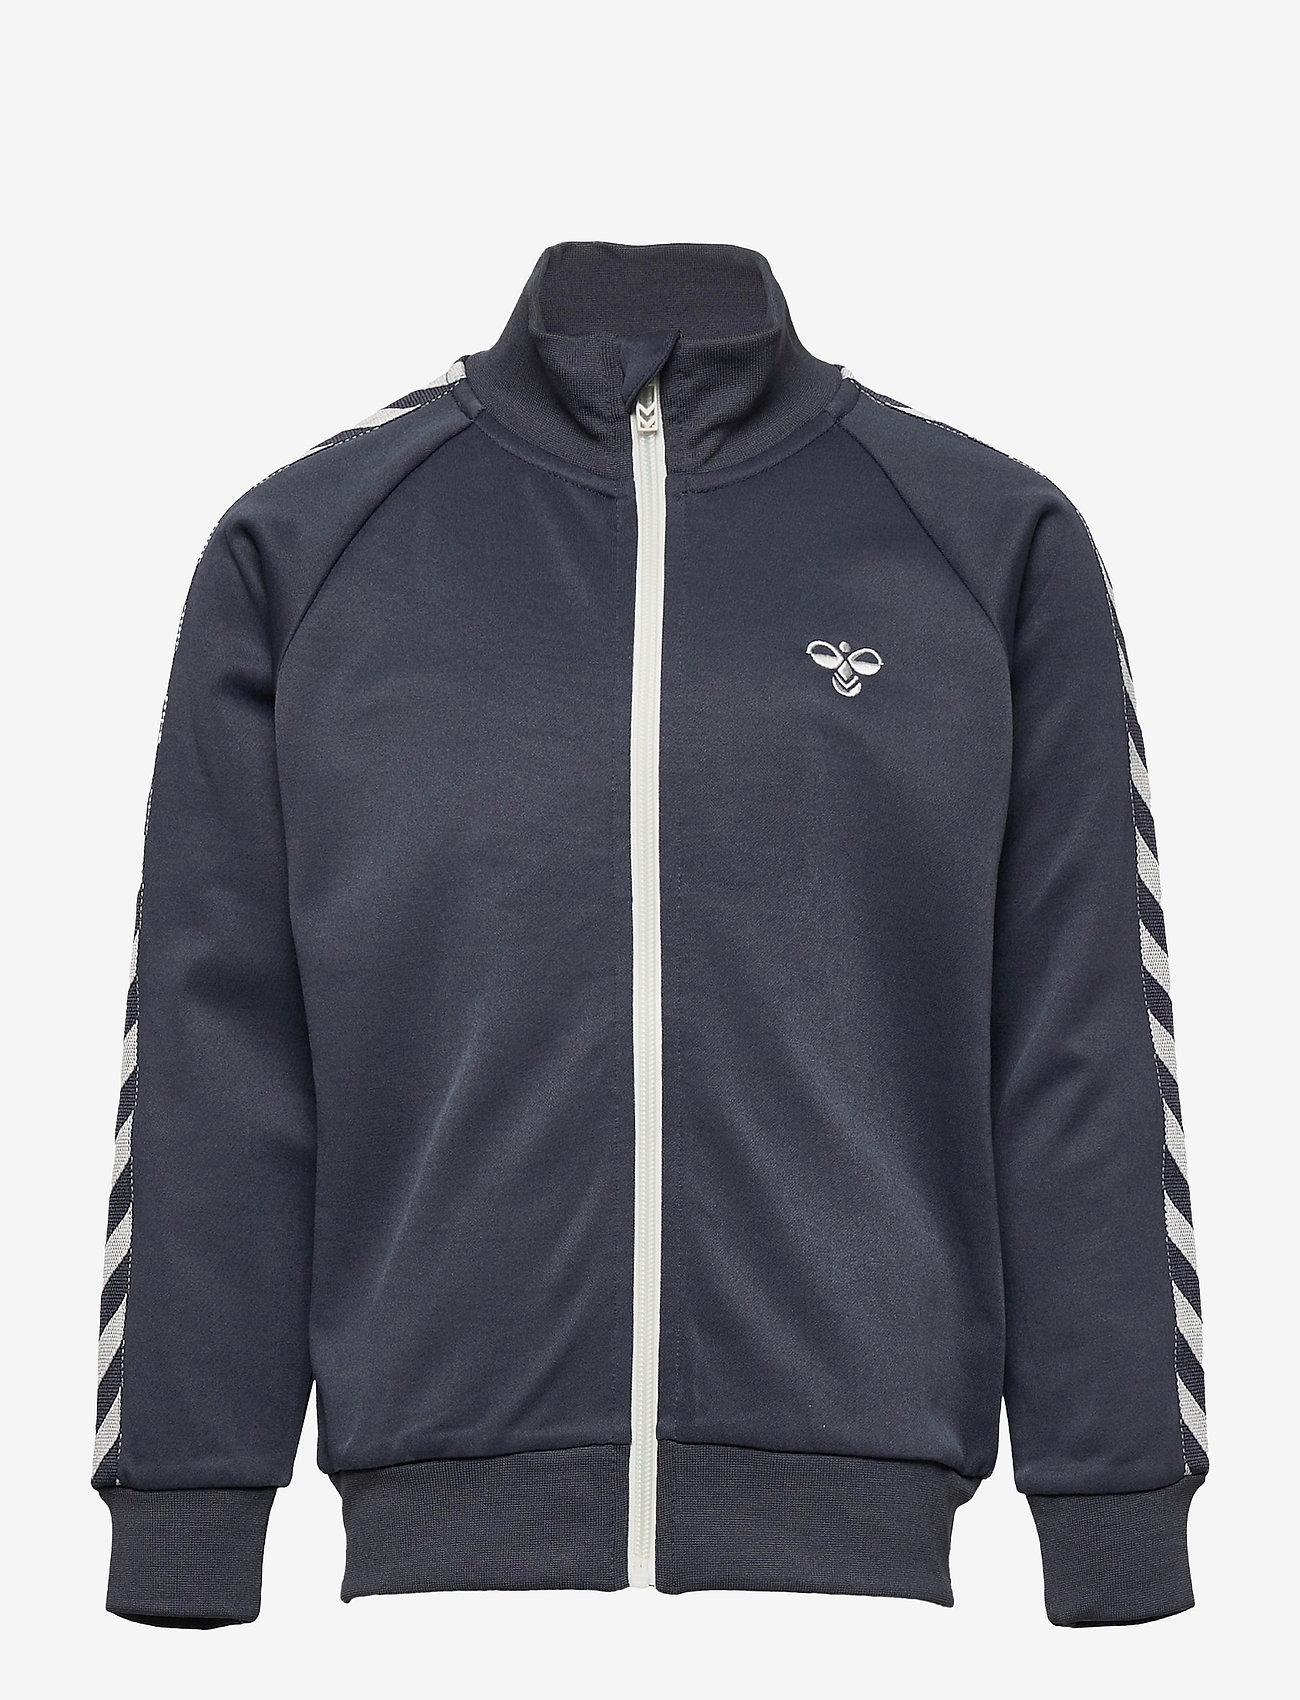 Hummel - HMLKICK ZIP JACKET - sweatshirts - ombre blue - 0